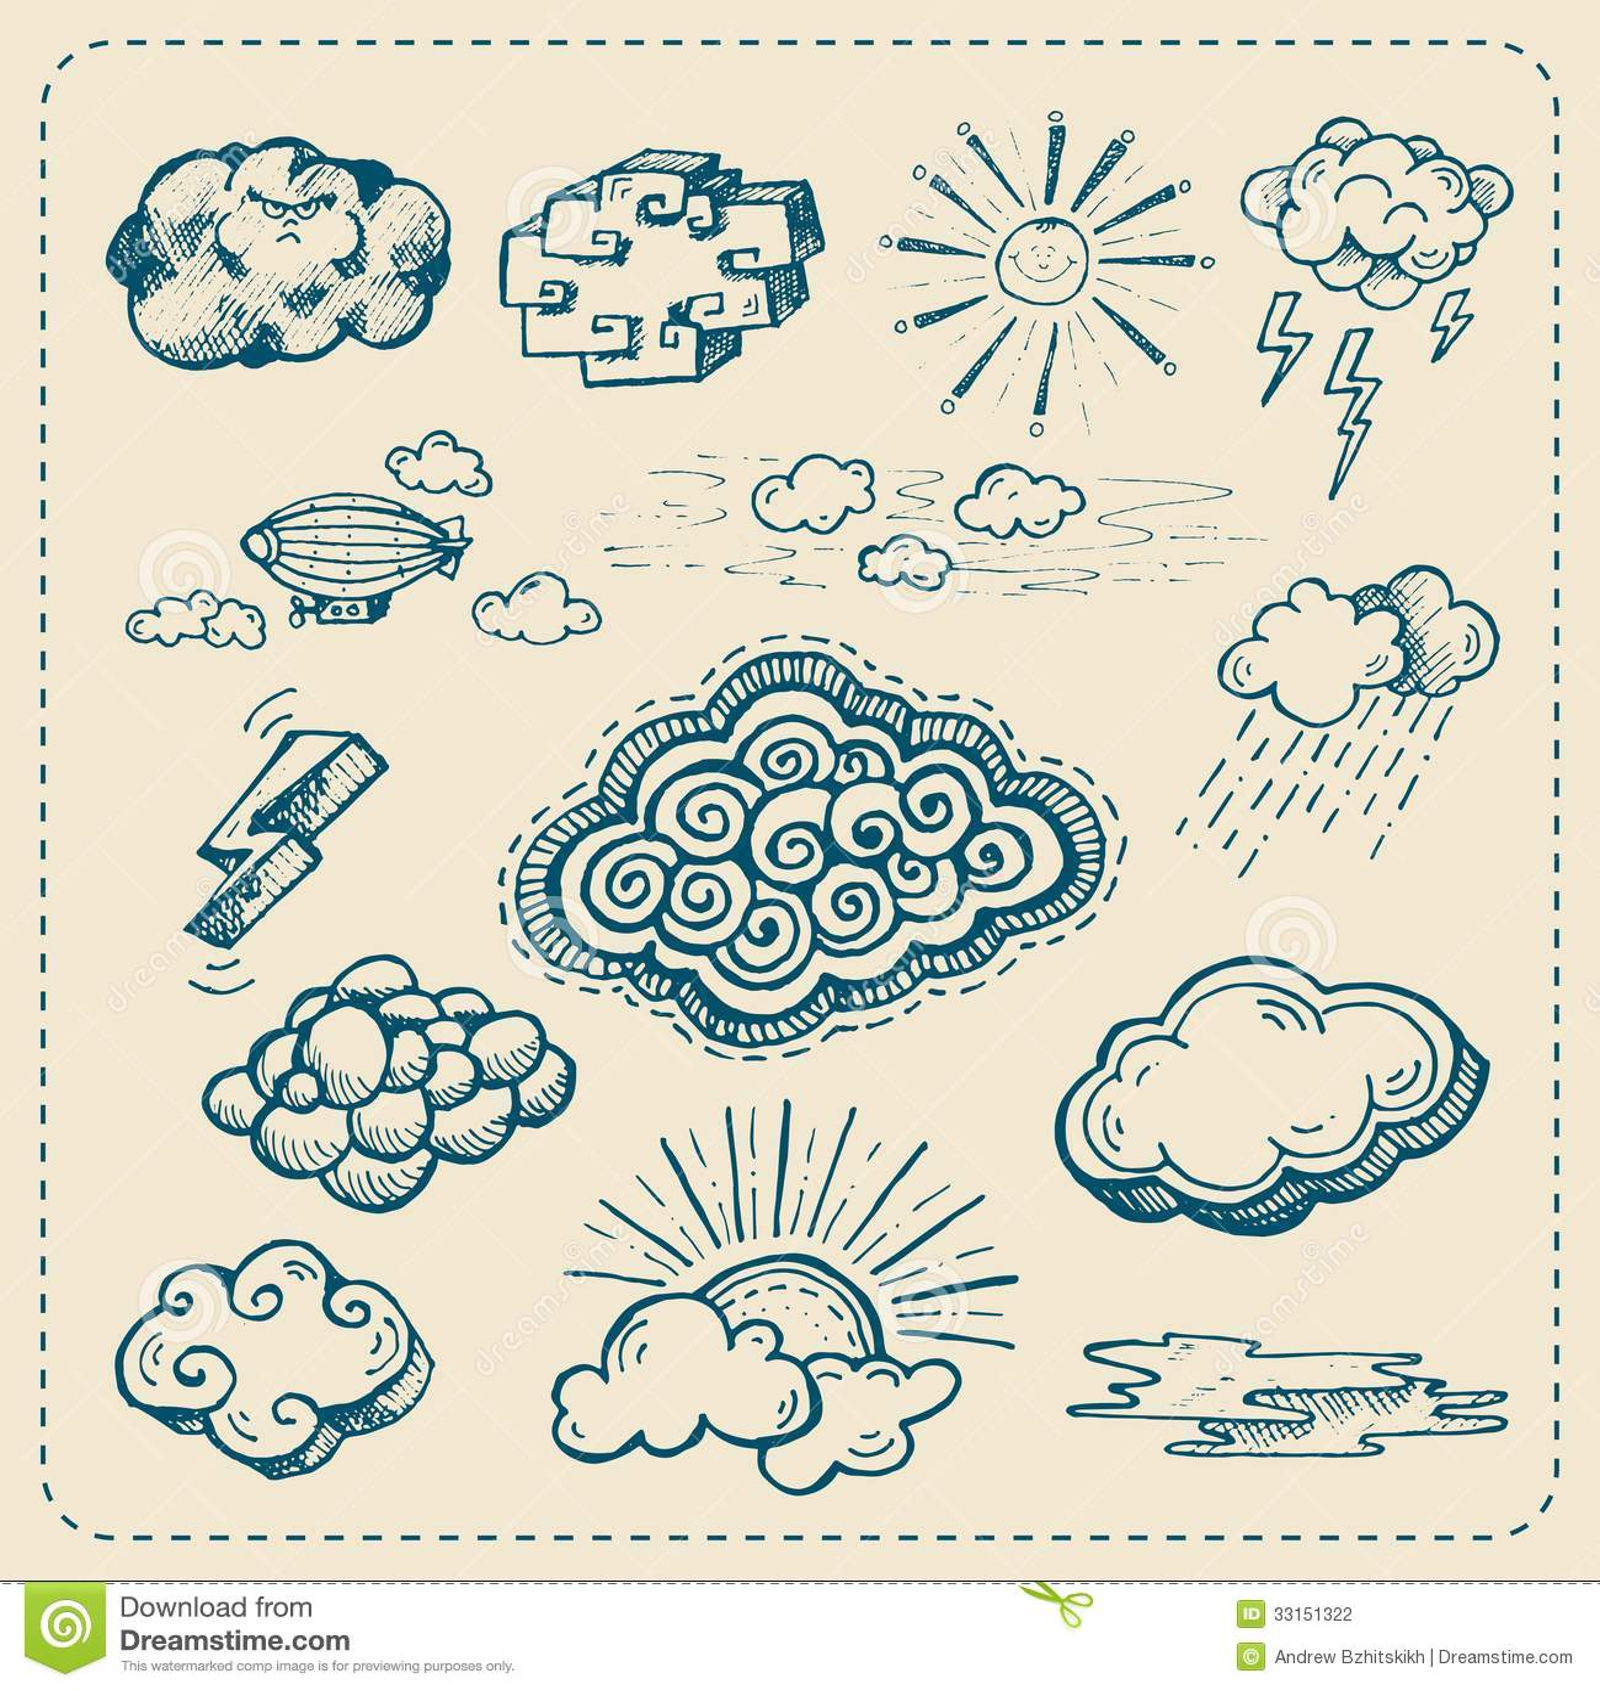 fluffy white clouds clip art